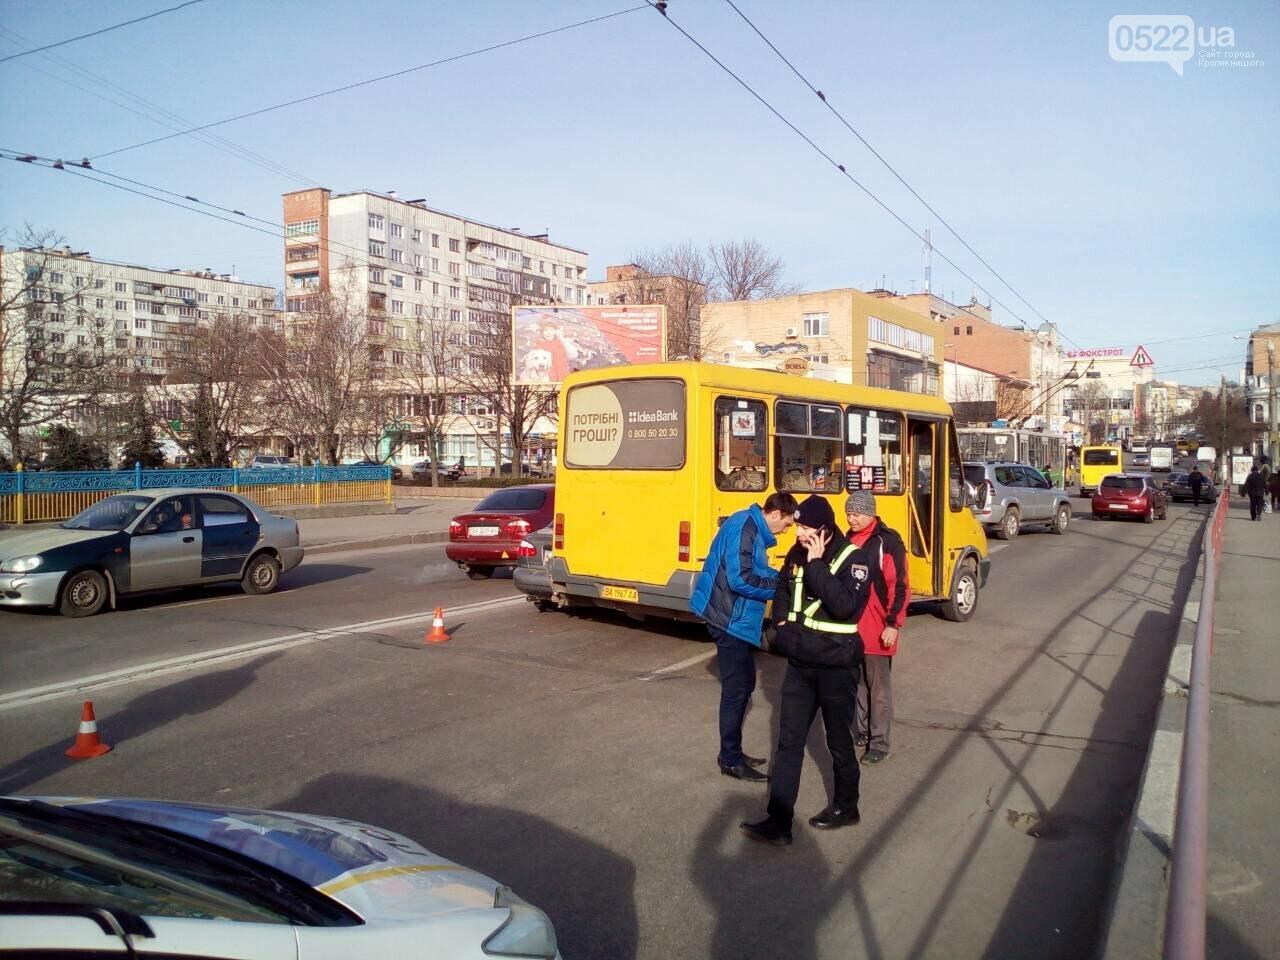 В Кропивницком произошло ДТП с участием маршрутки. ФОТО, фото-1